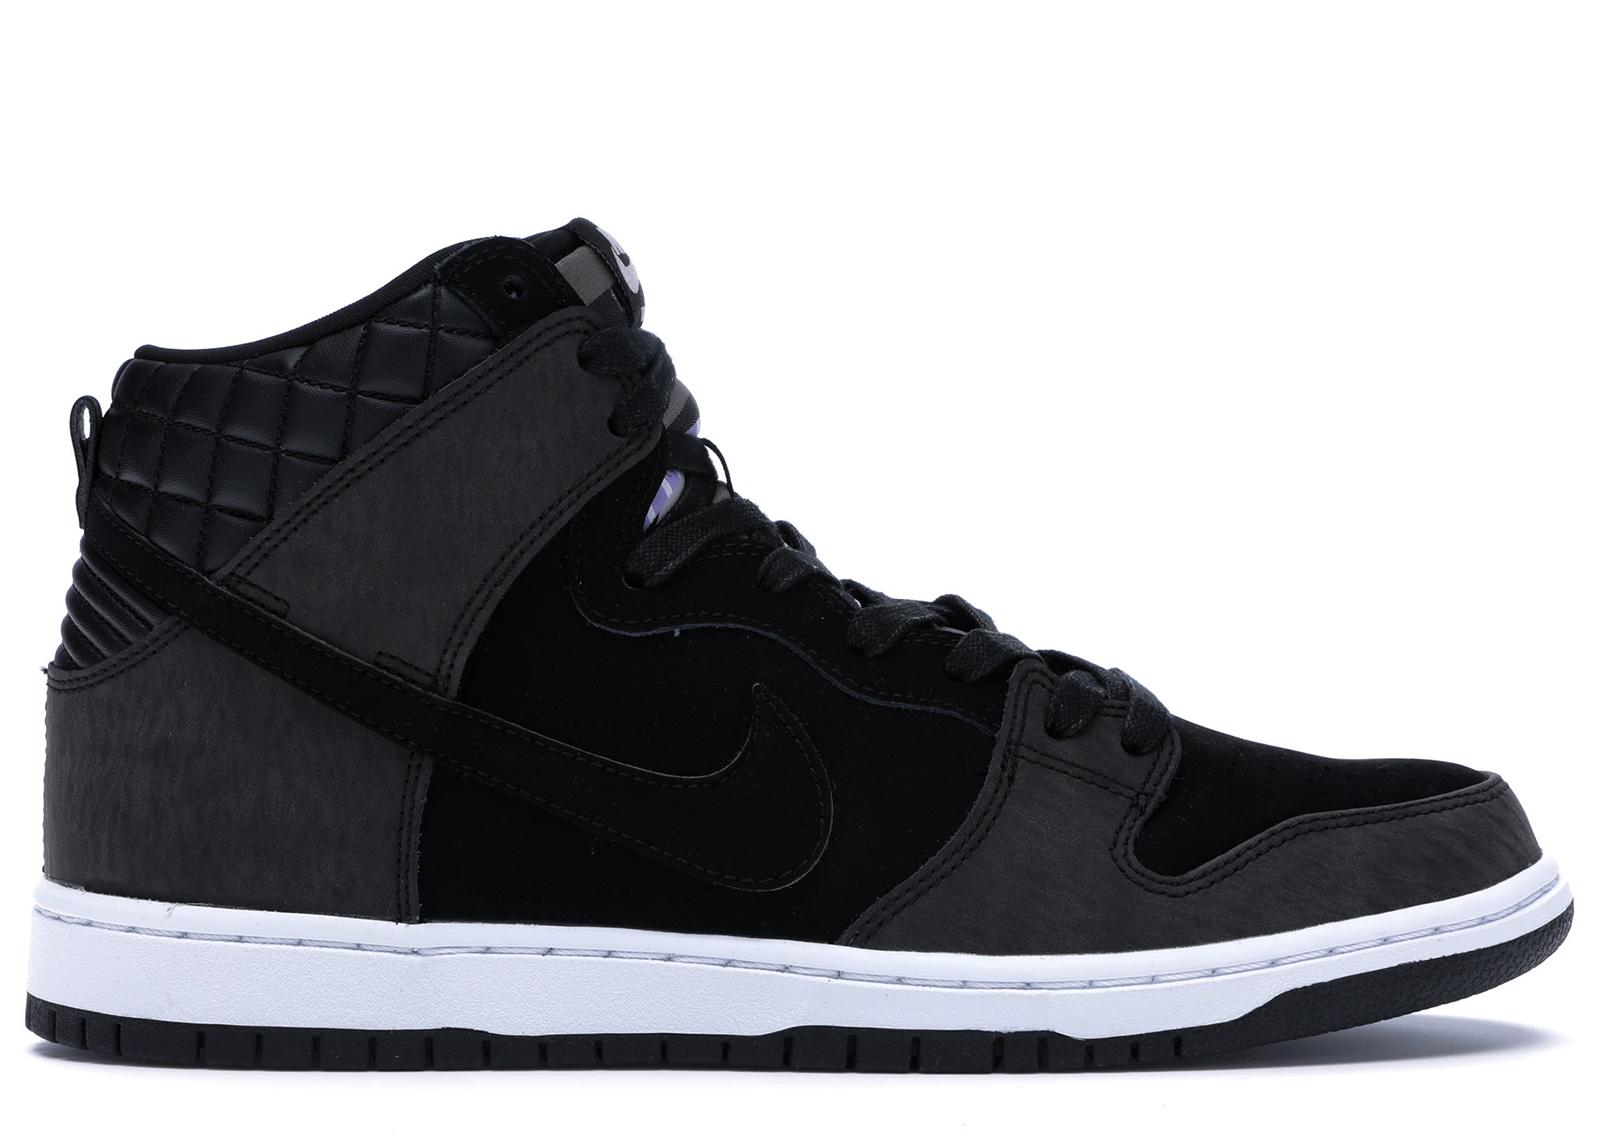 Nike Dunk SB High Civilist Berlin